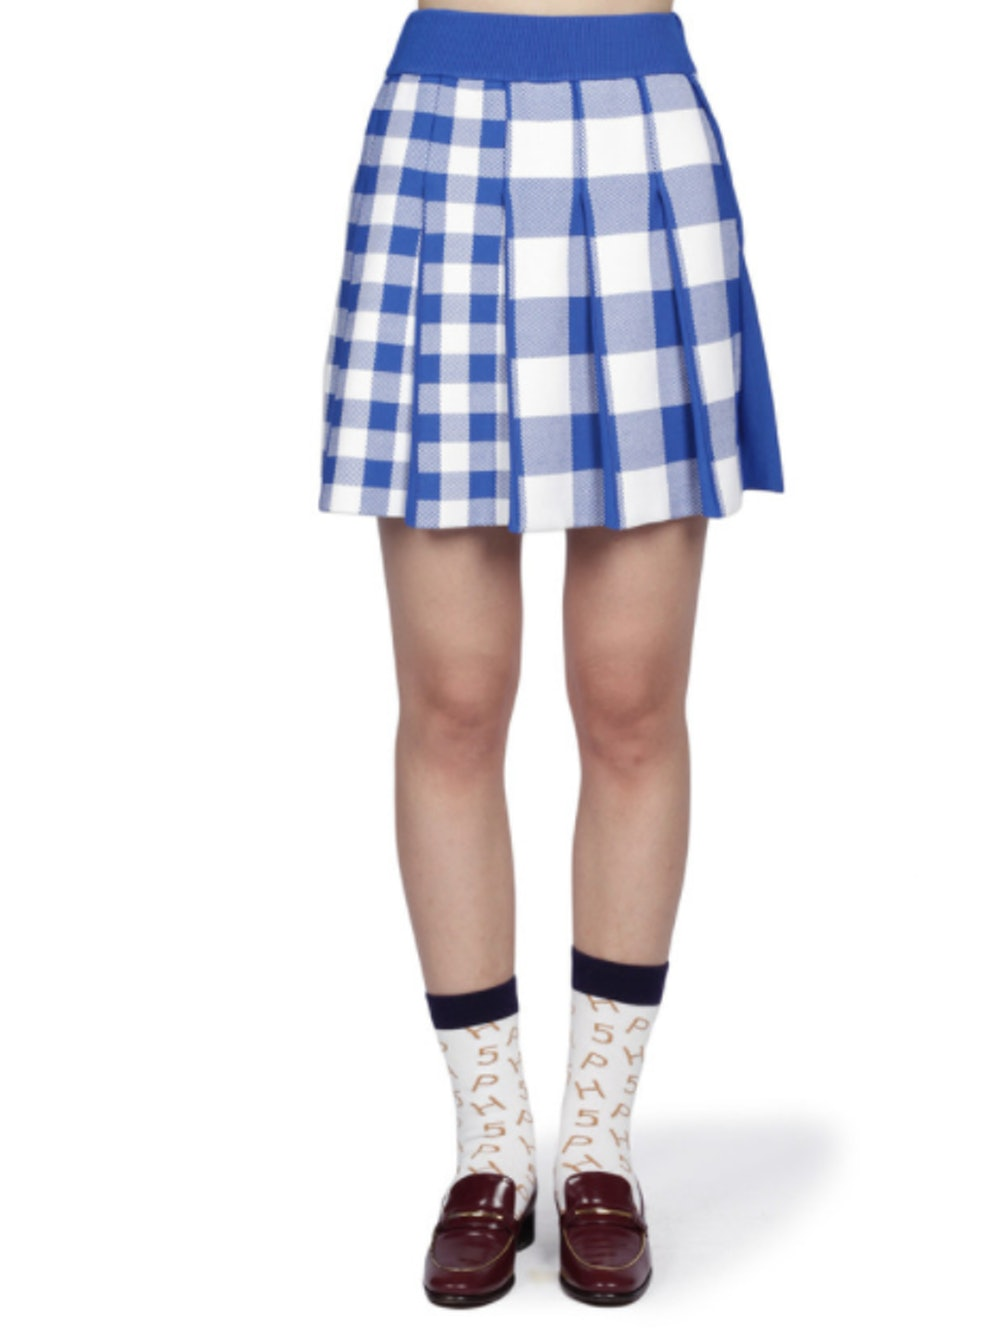 Barbara Pleated Mini Skirt - Electric Blue